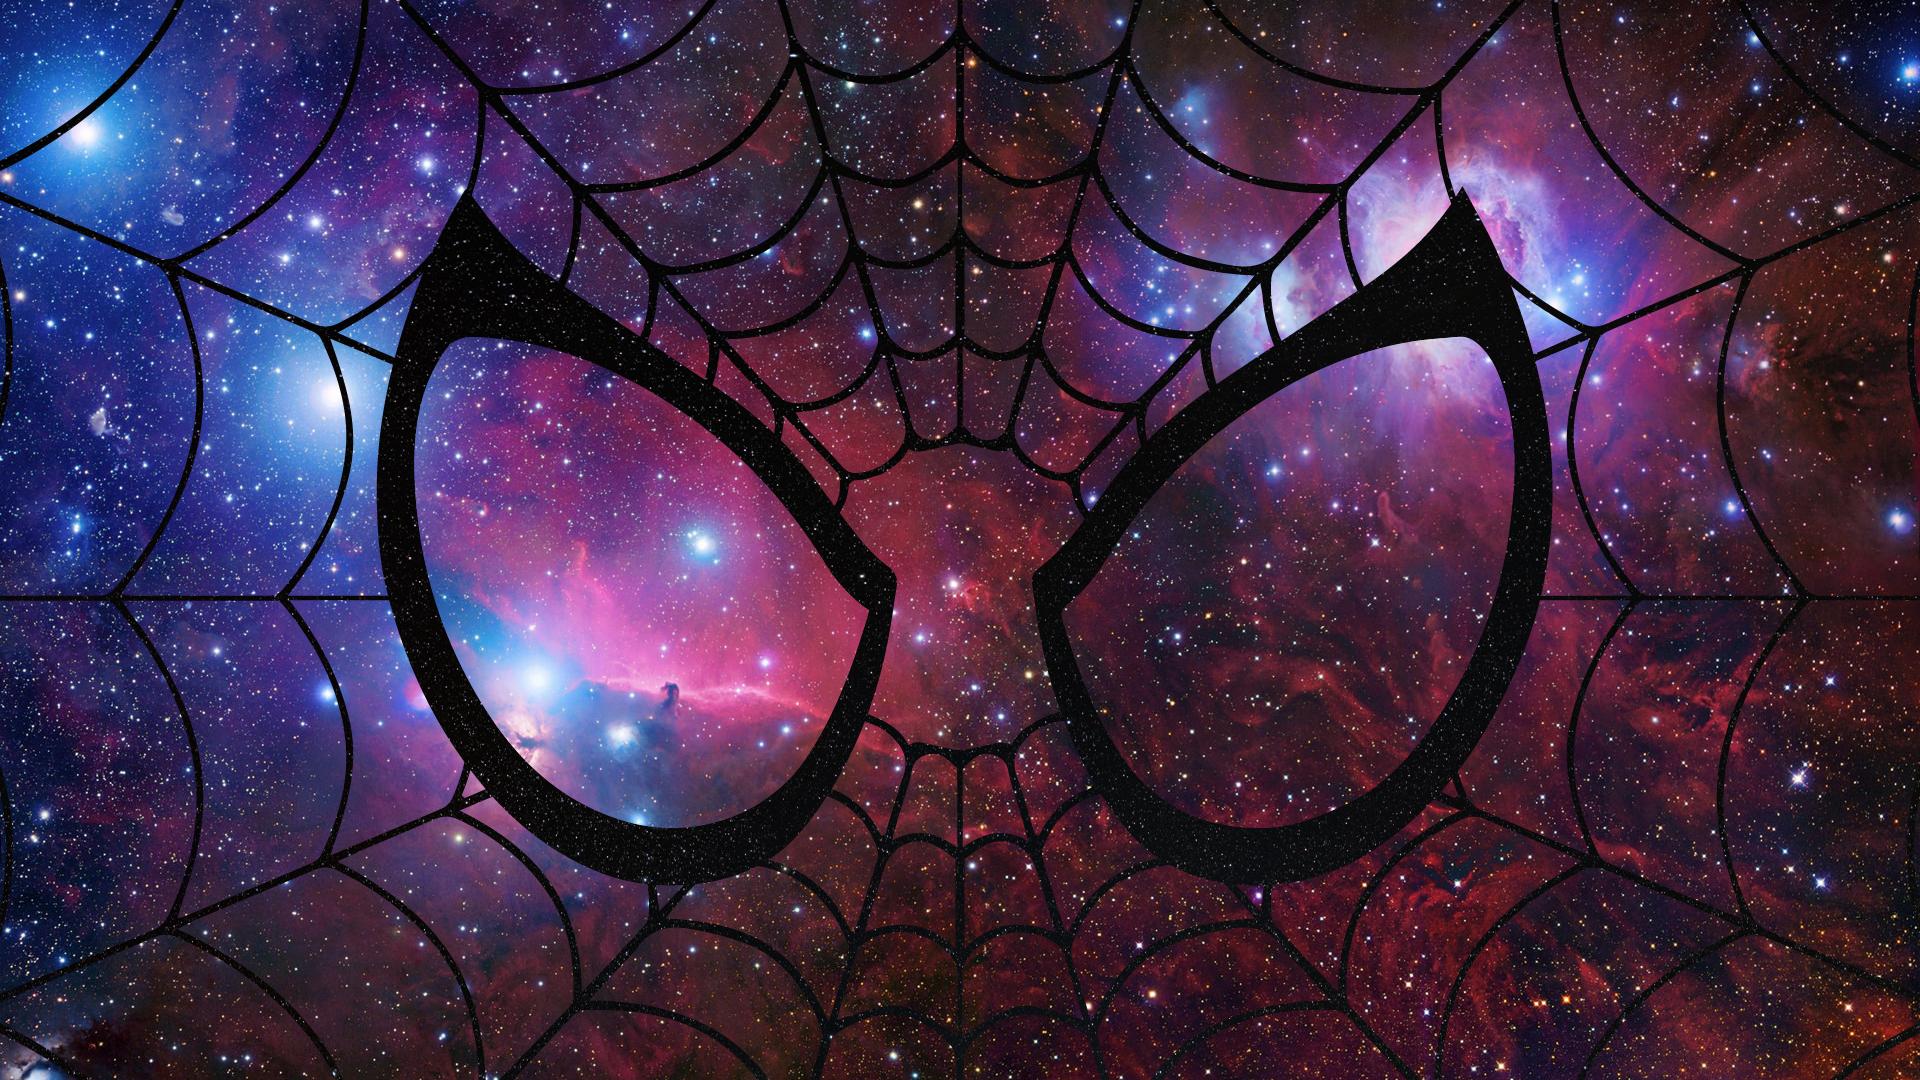 Spider-Verse Wallpaper by DrBoxHead on DeviantArt